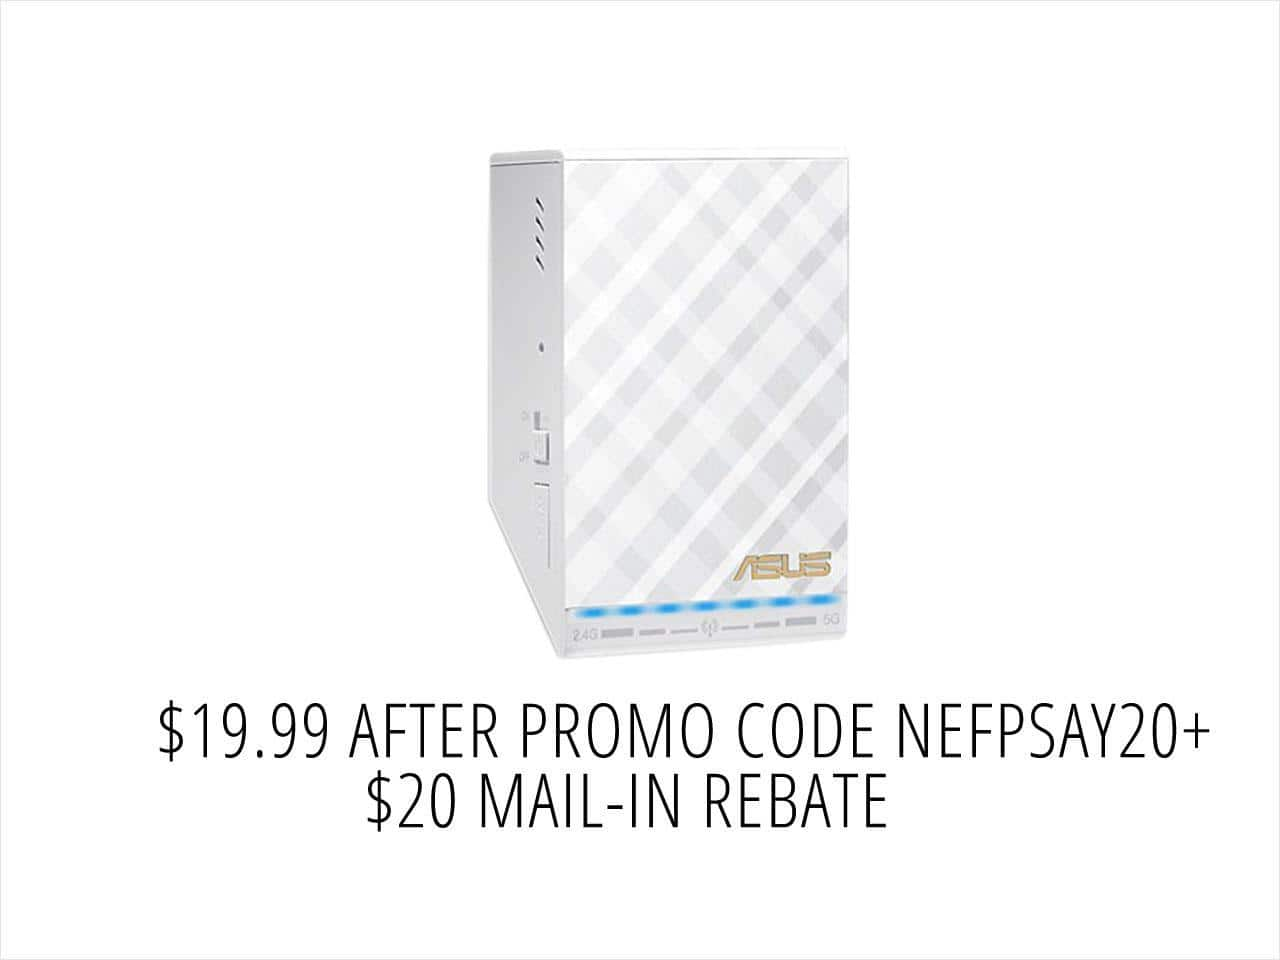 ASUS RP-AC52 AC750 Repeater / Access Point / Media Bridge $20AR @NF